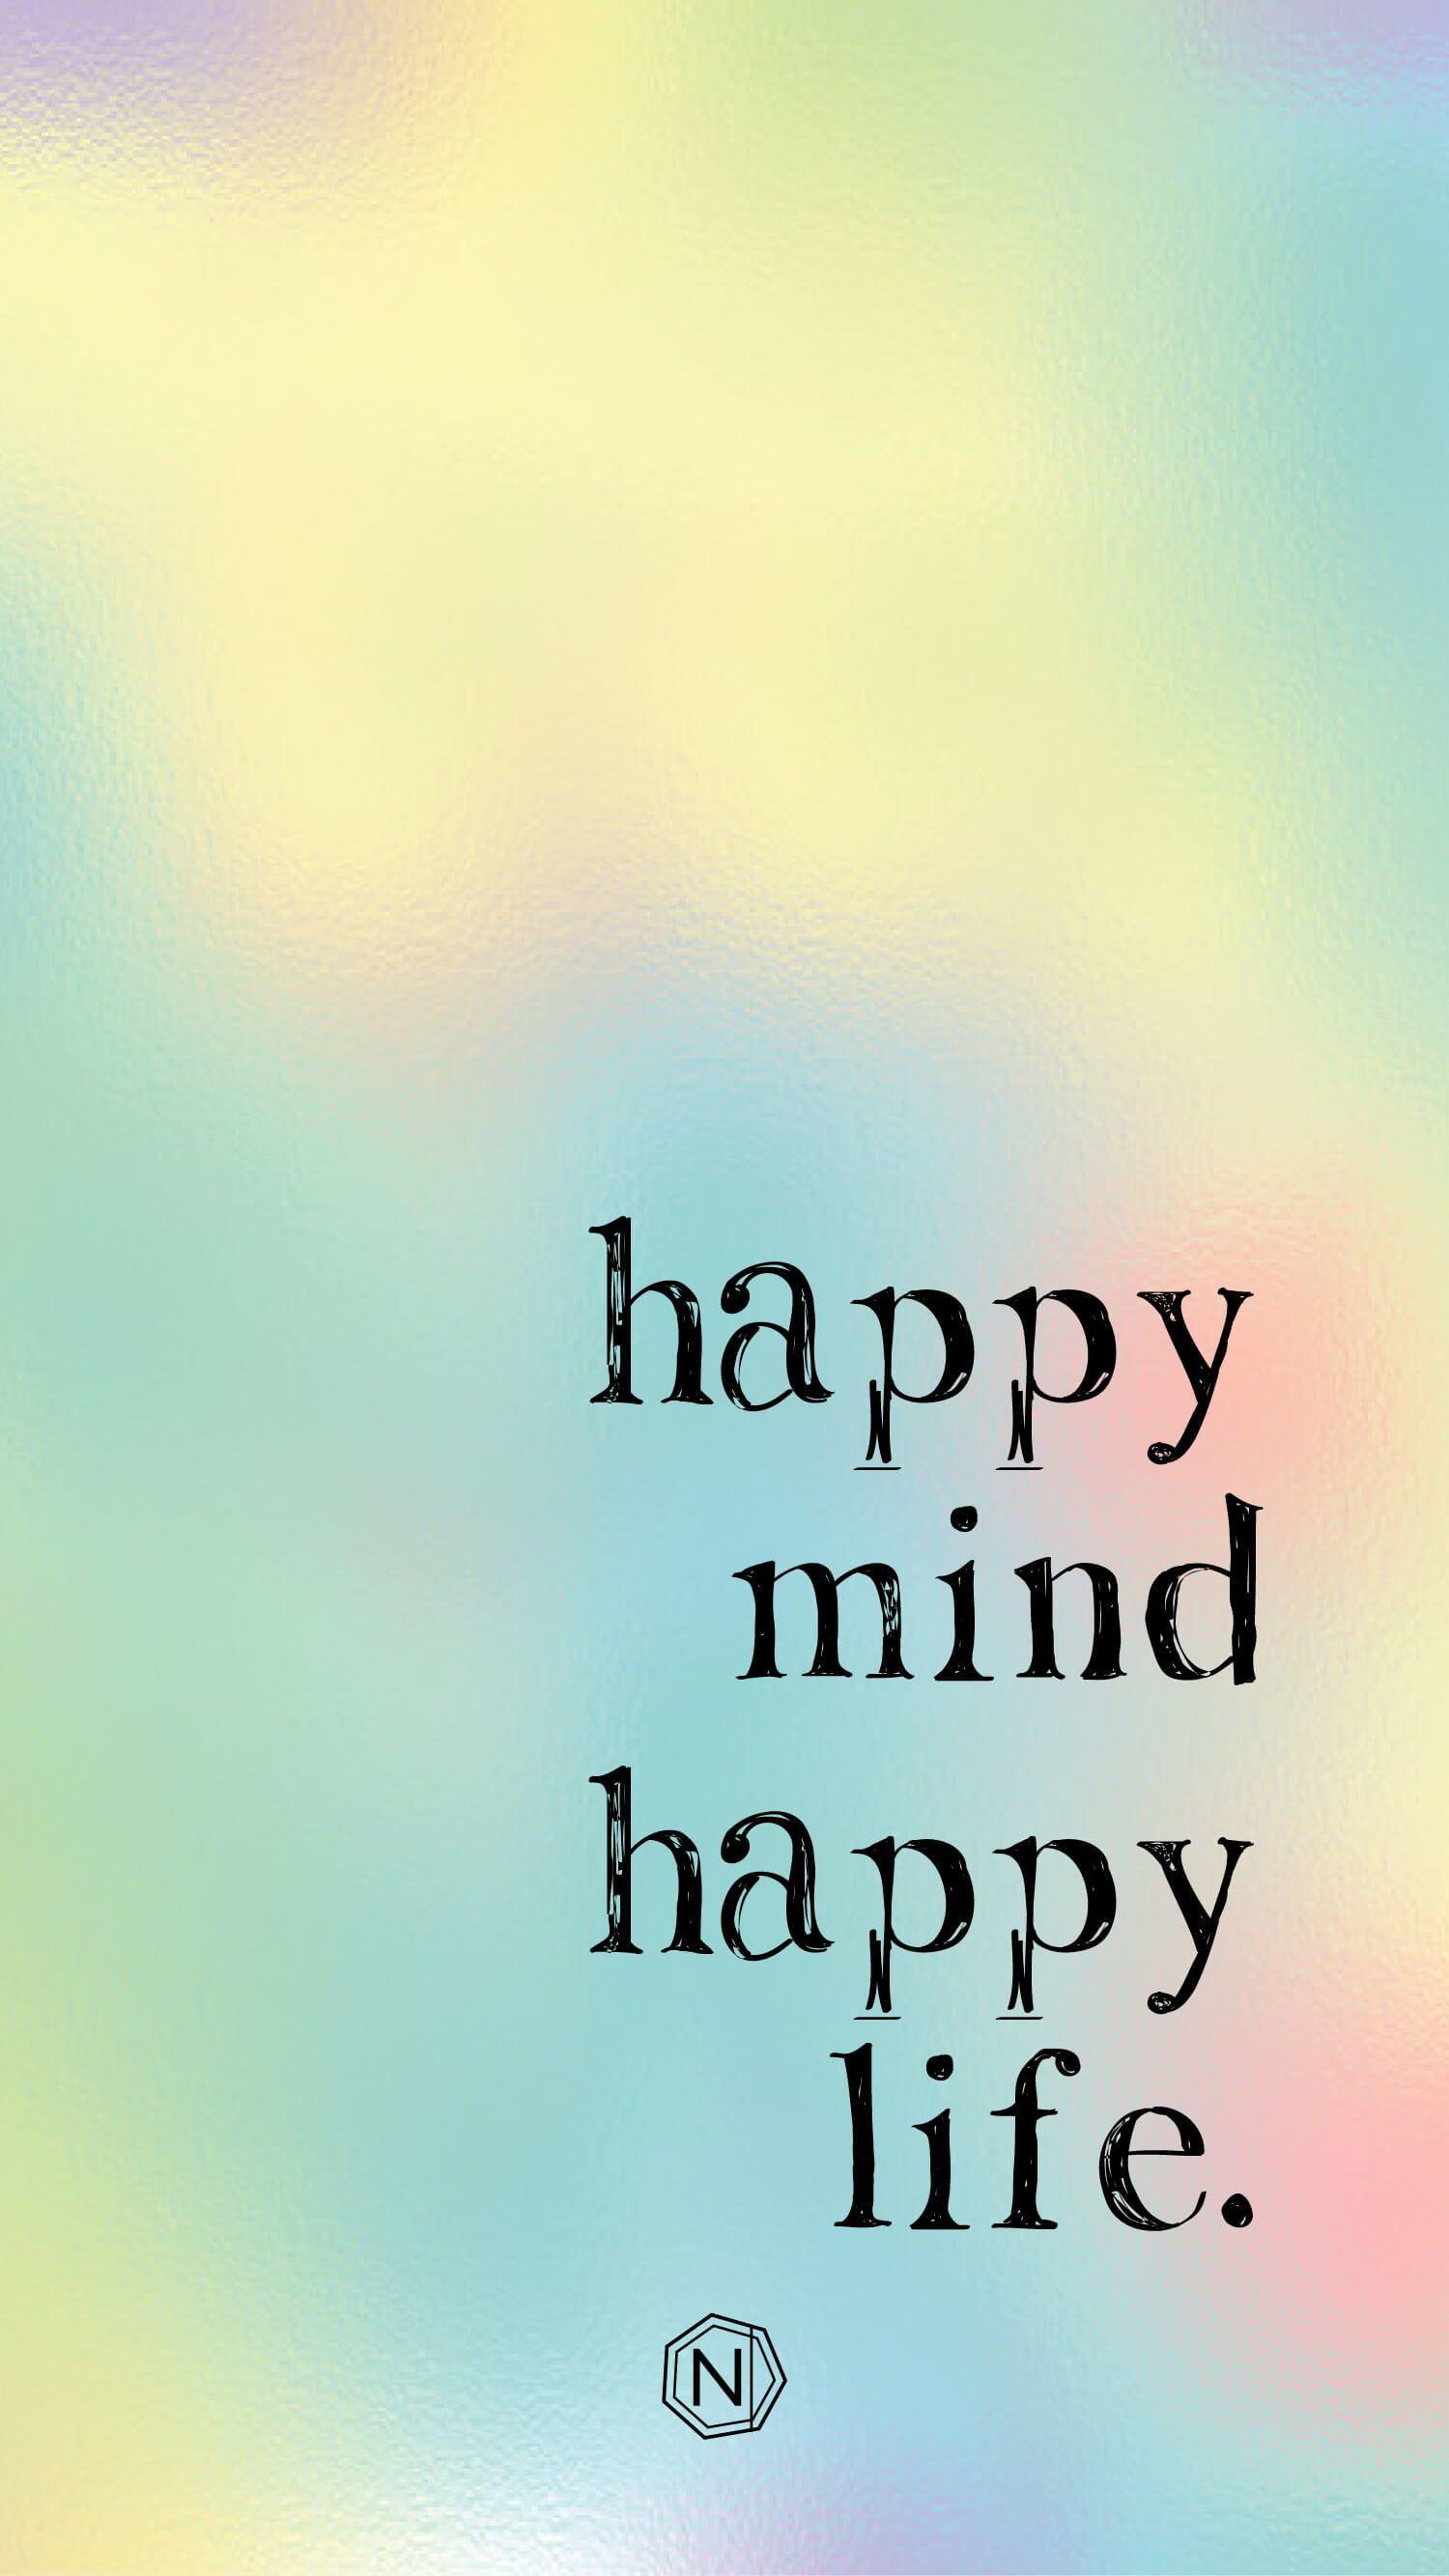 Njooys Happy Mind Happy Life Happy Quotes Inspirational Happy Minds